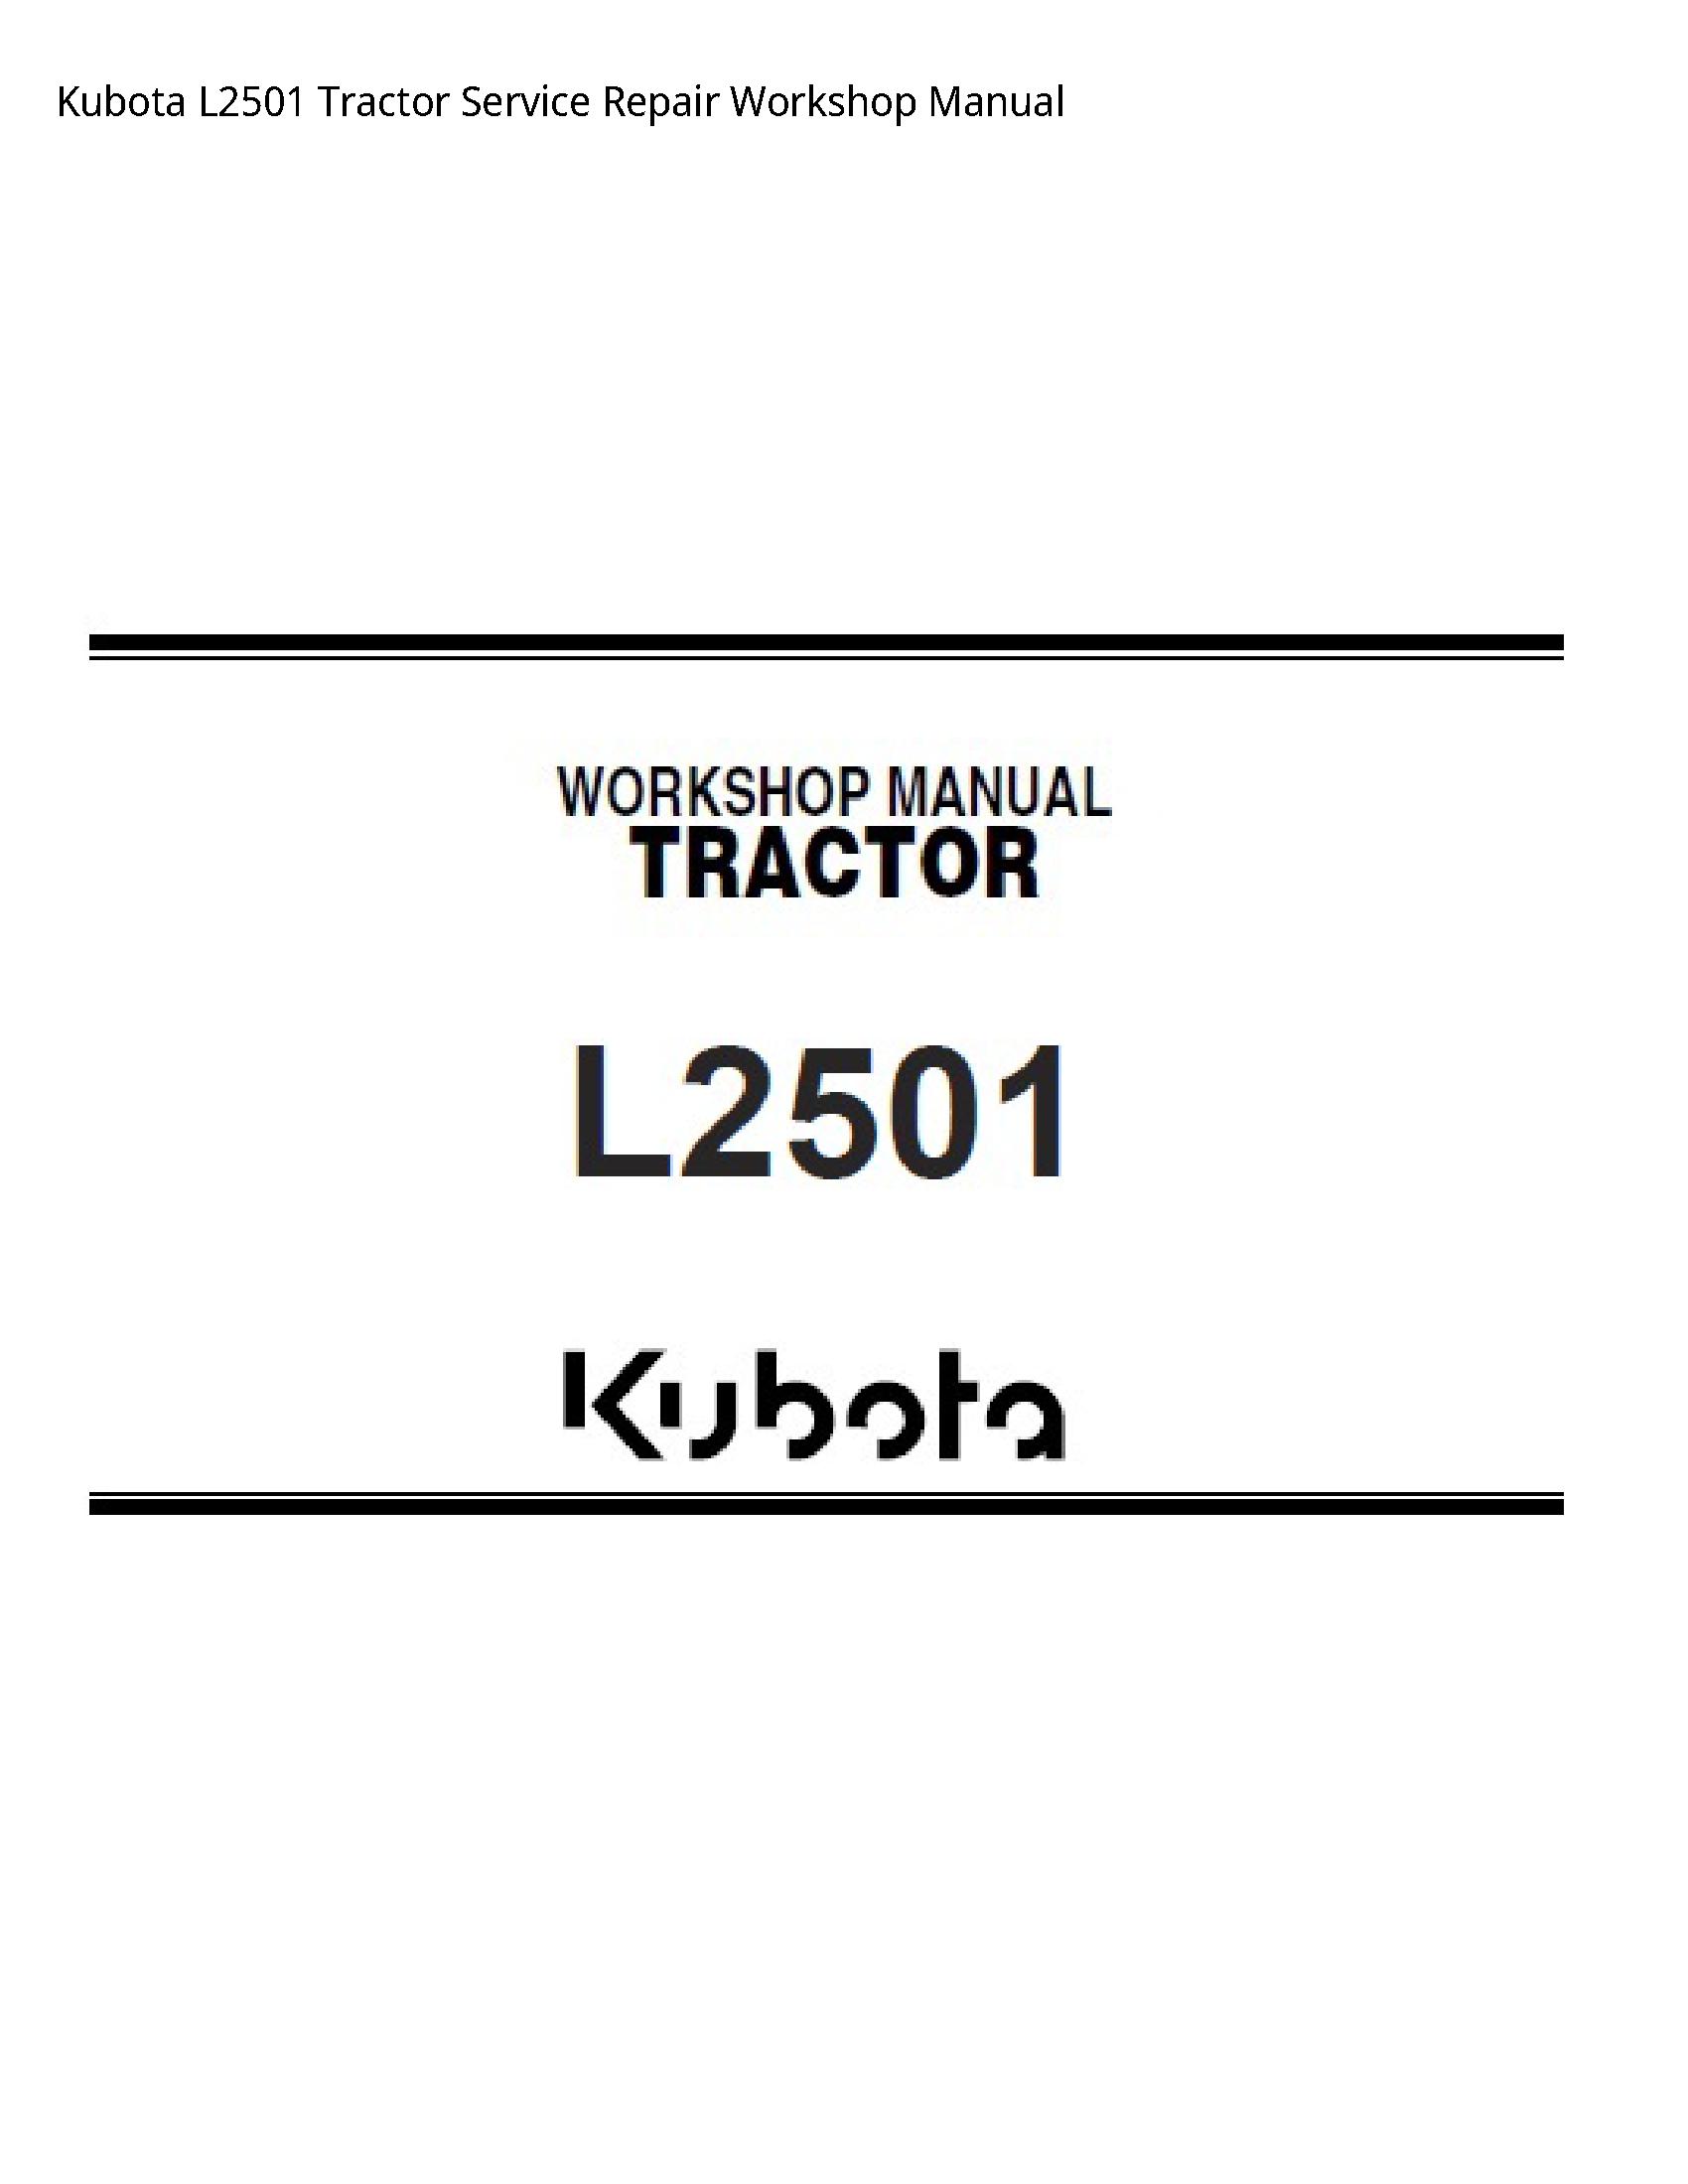 Kubota L2501 Tractor manual